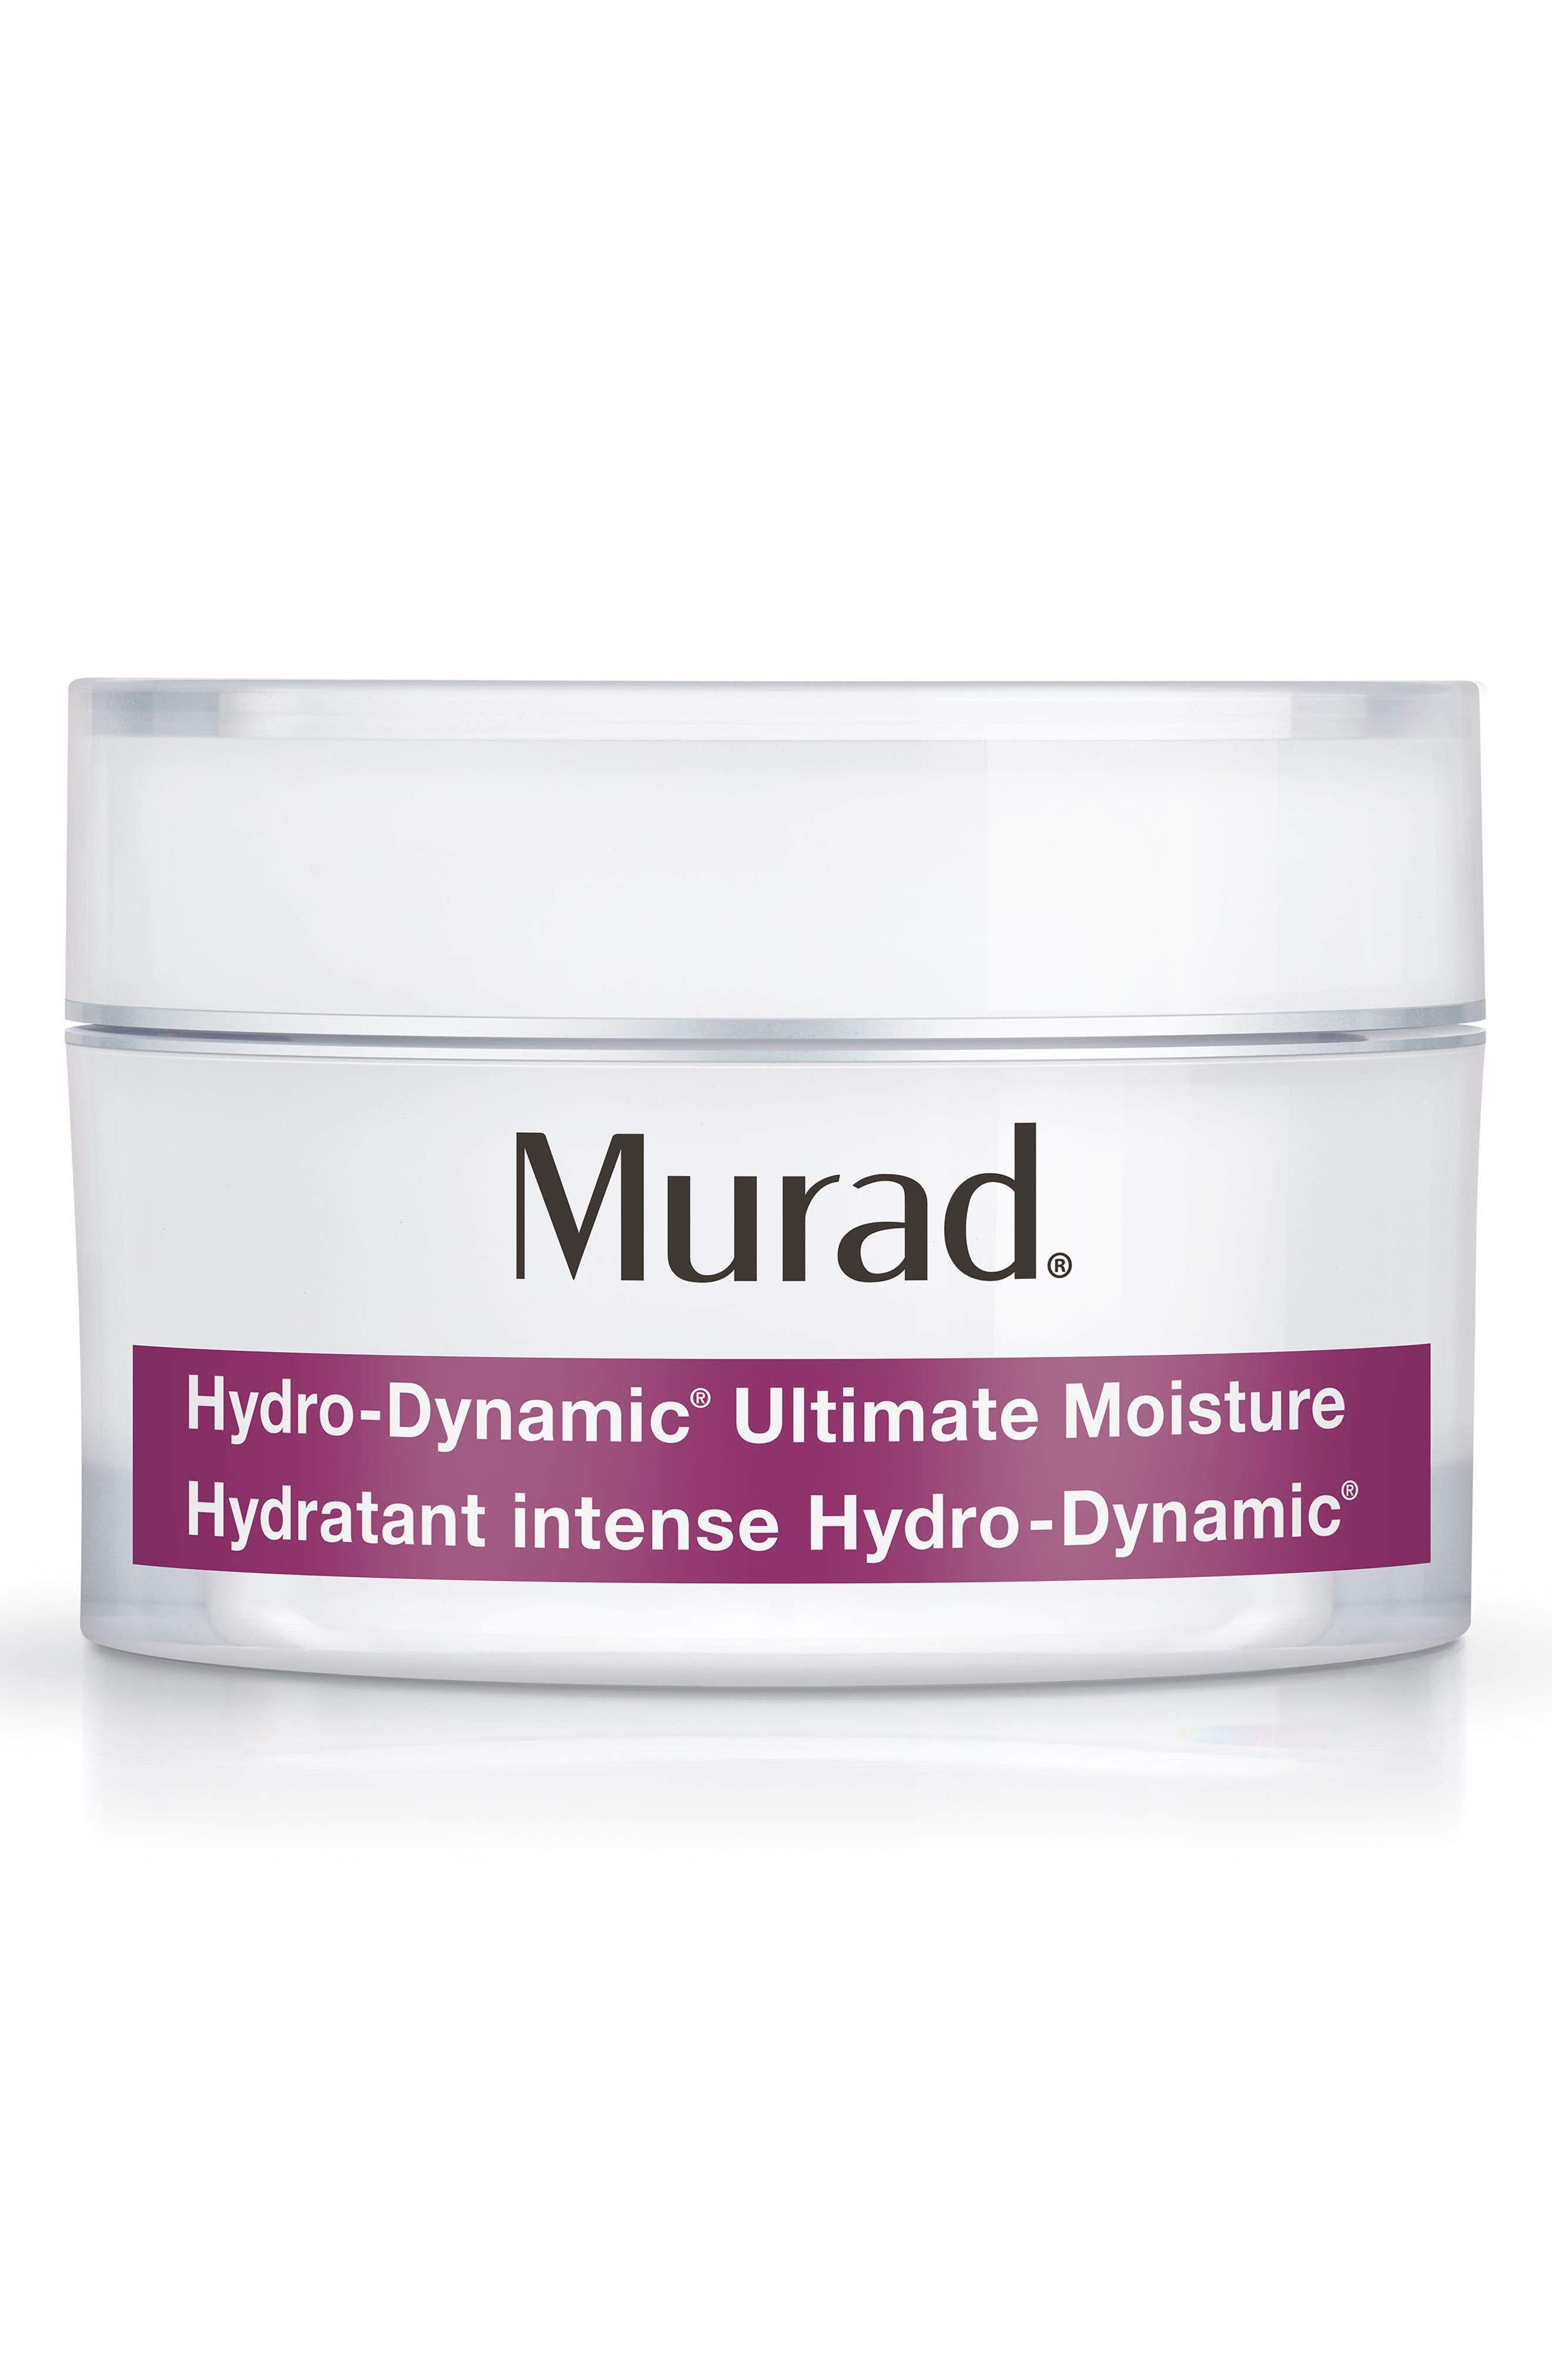 Murad® Hydro-Dynamic® Ultimate Moisture